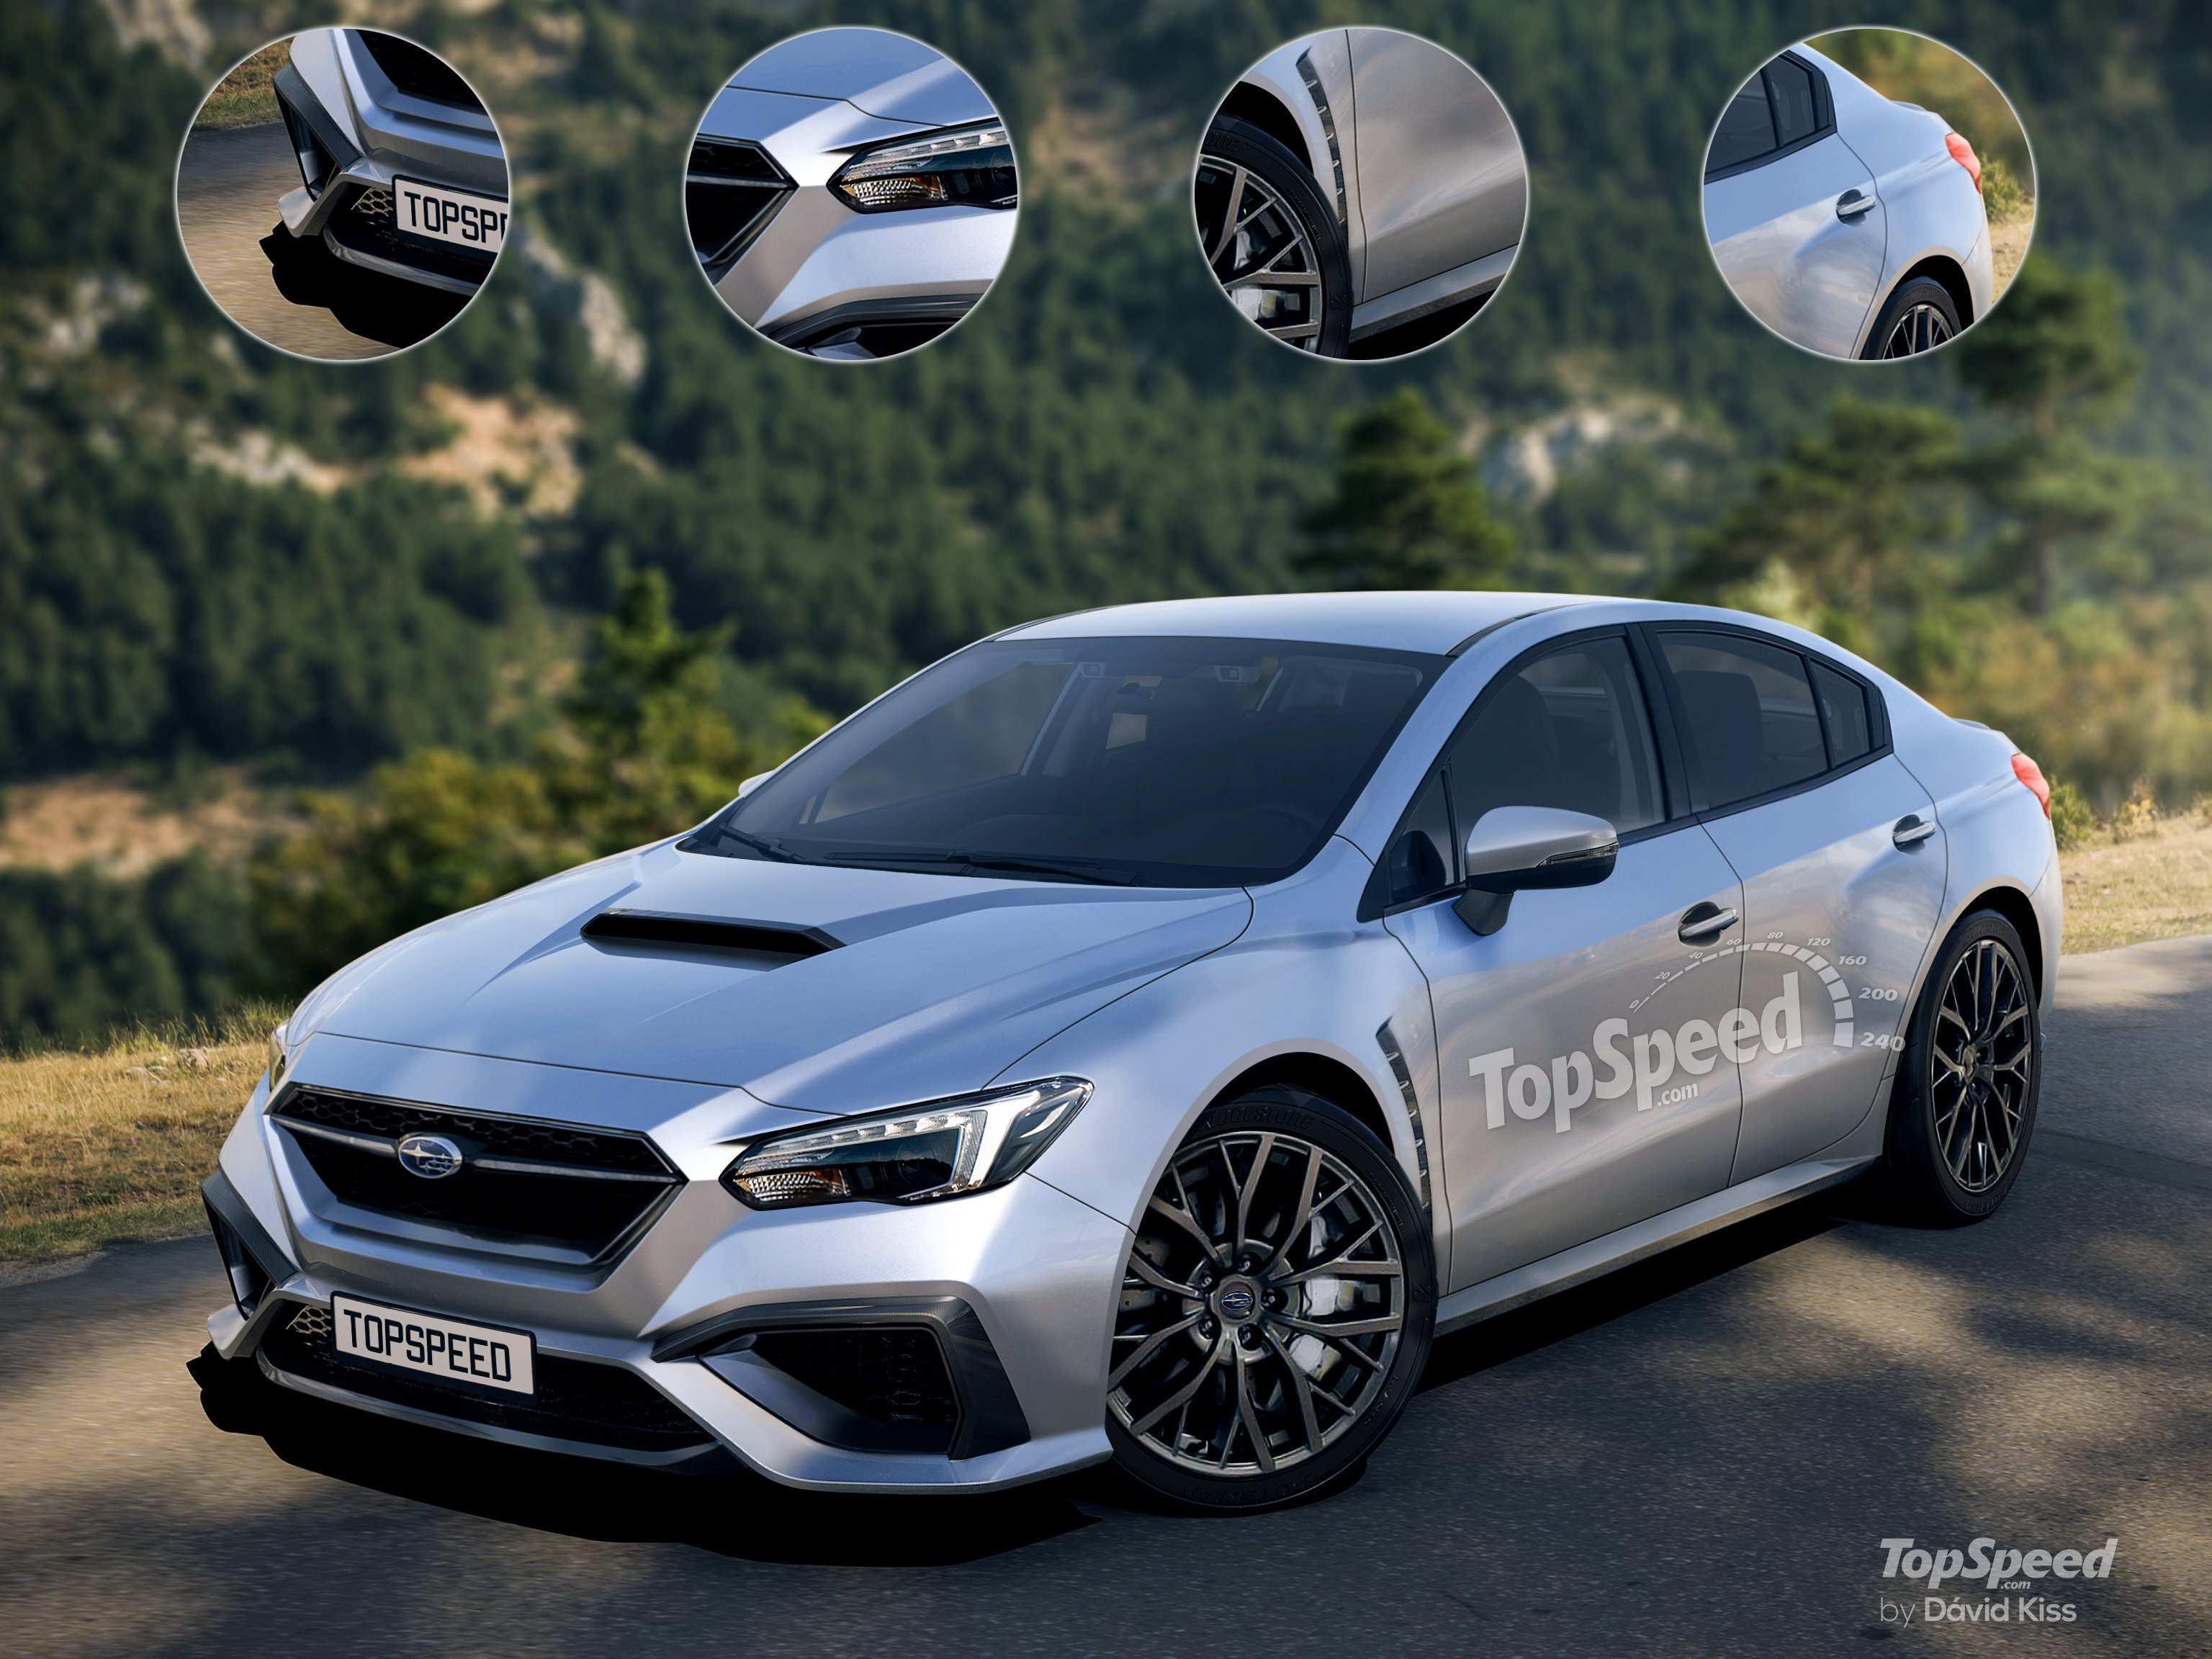 27 Great 2020 Subaru Impreza Review with 2020 Subaru Impreza